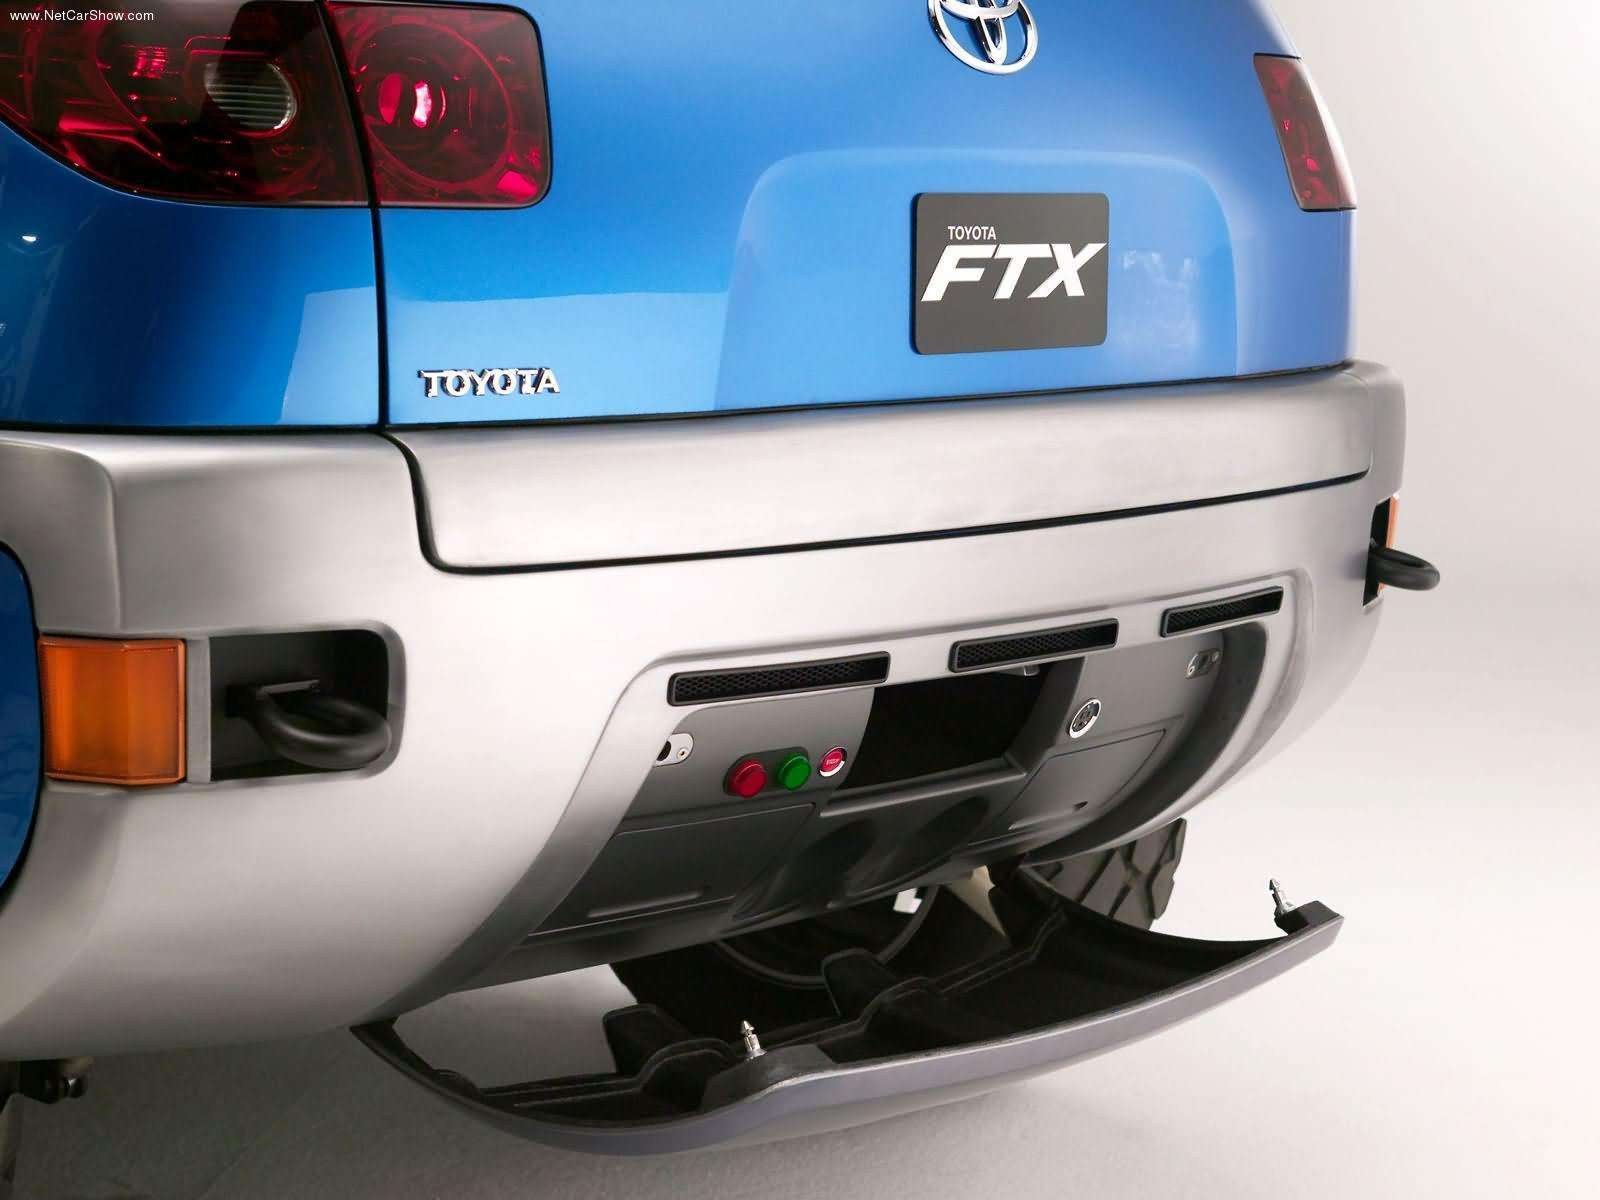 Toyota-FTX_Concept_2004_1600x1200_wallpaper_20.jpg